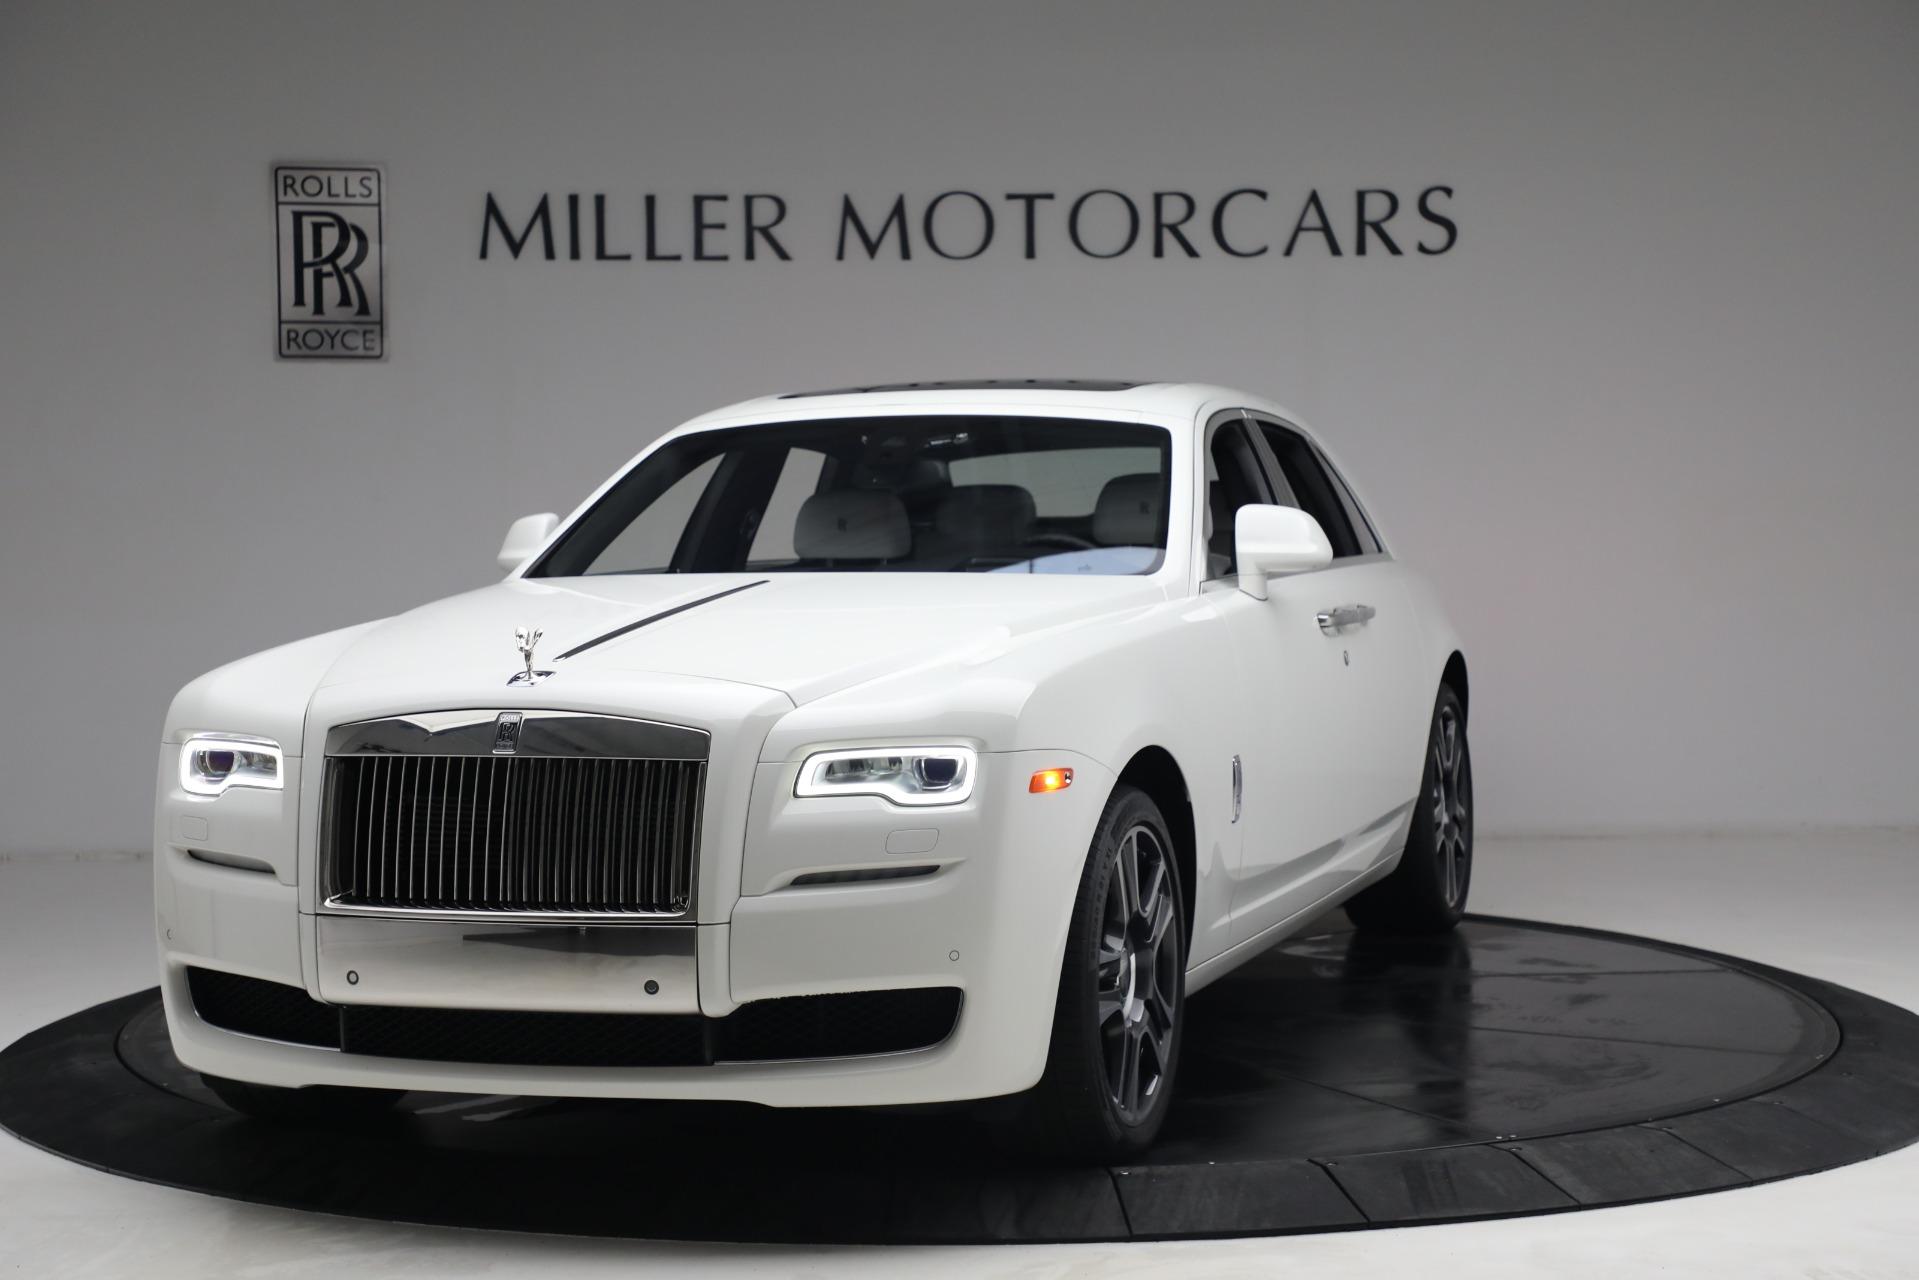 Used 2017 Rolls-Royce Ghost for sale $219,900 at Rolls-Royce Motor Cars Greenwich in Greenwich CT 06830 1